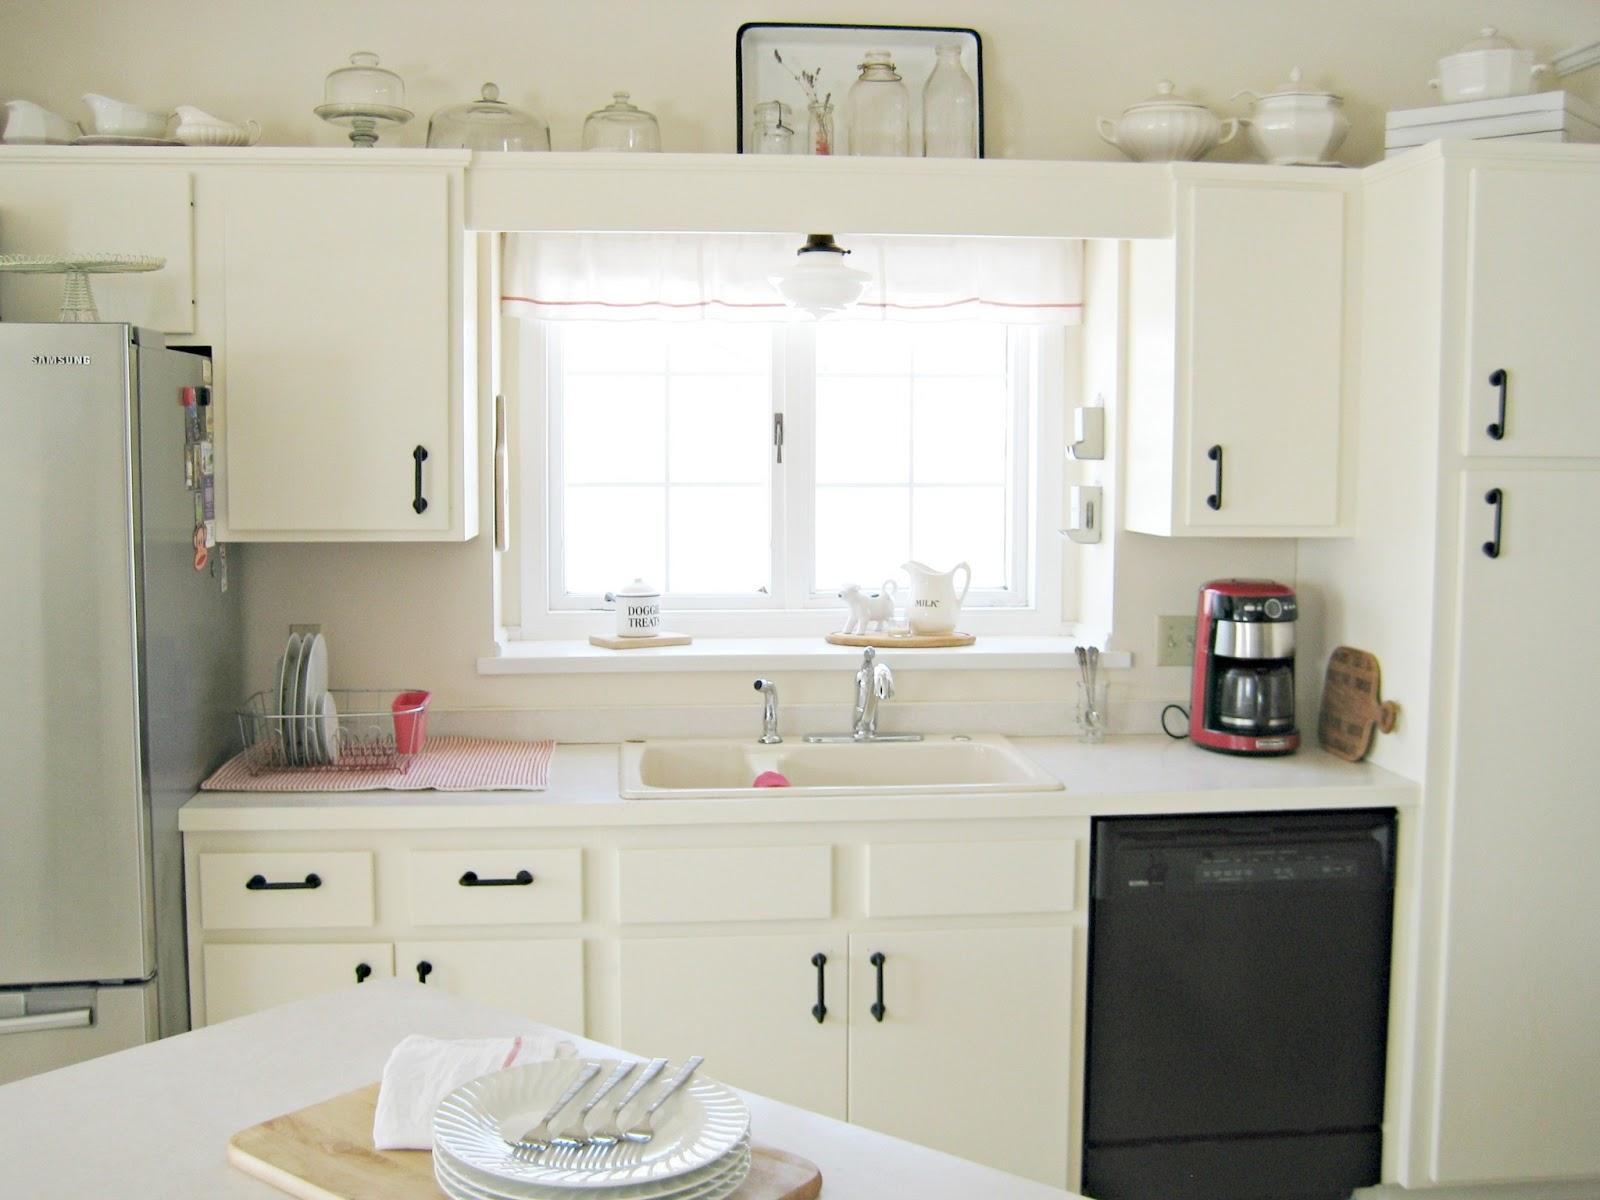 køkken-gardiner-vindue-skønne-køkken-vindue-gardiner-køkken-vindue-gardiner